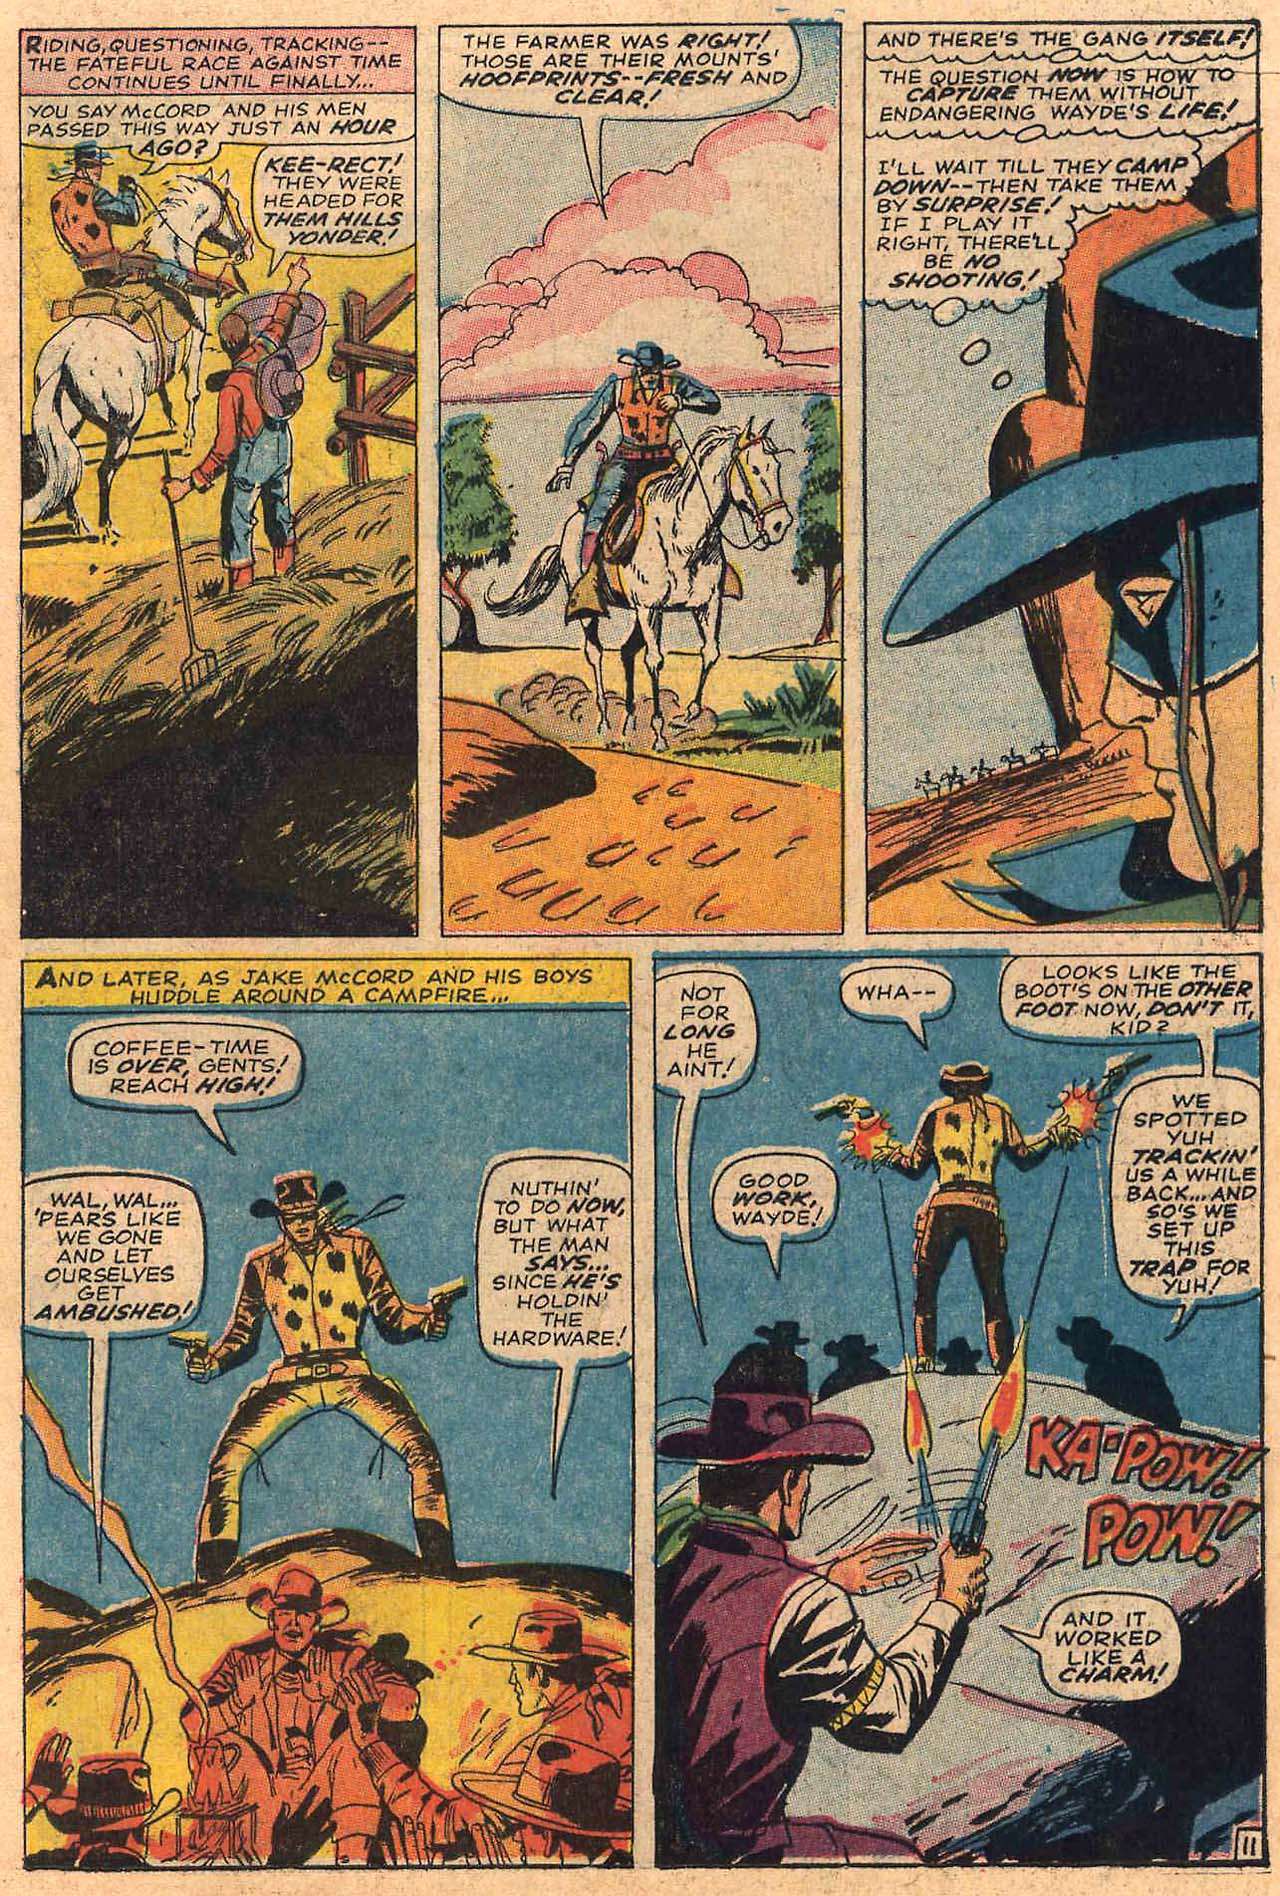 Read online Two-Gun Kid comic -  Issue #84 - 15